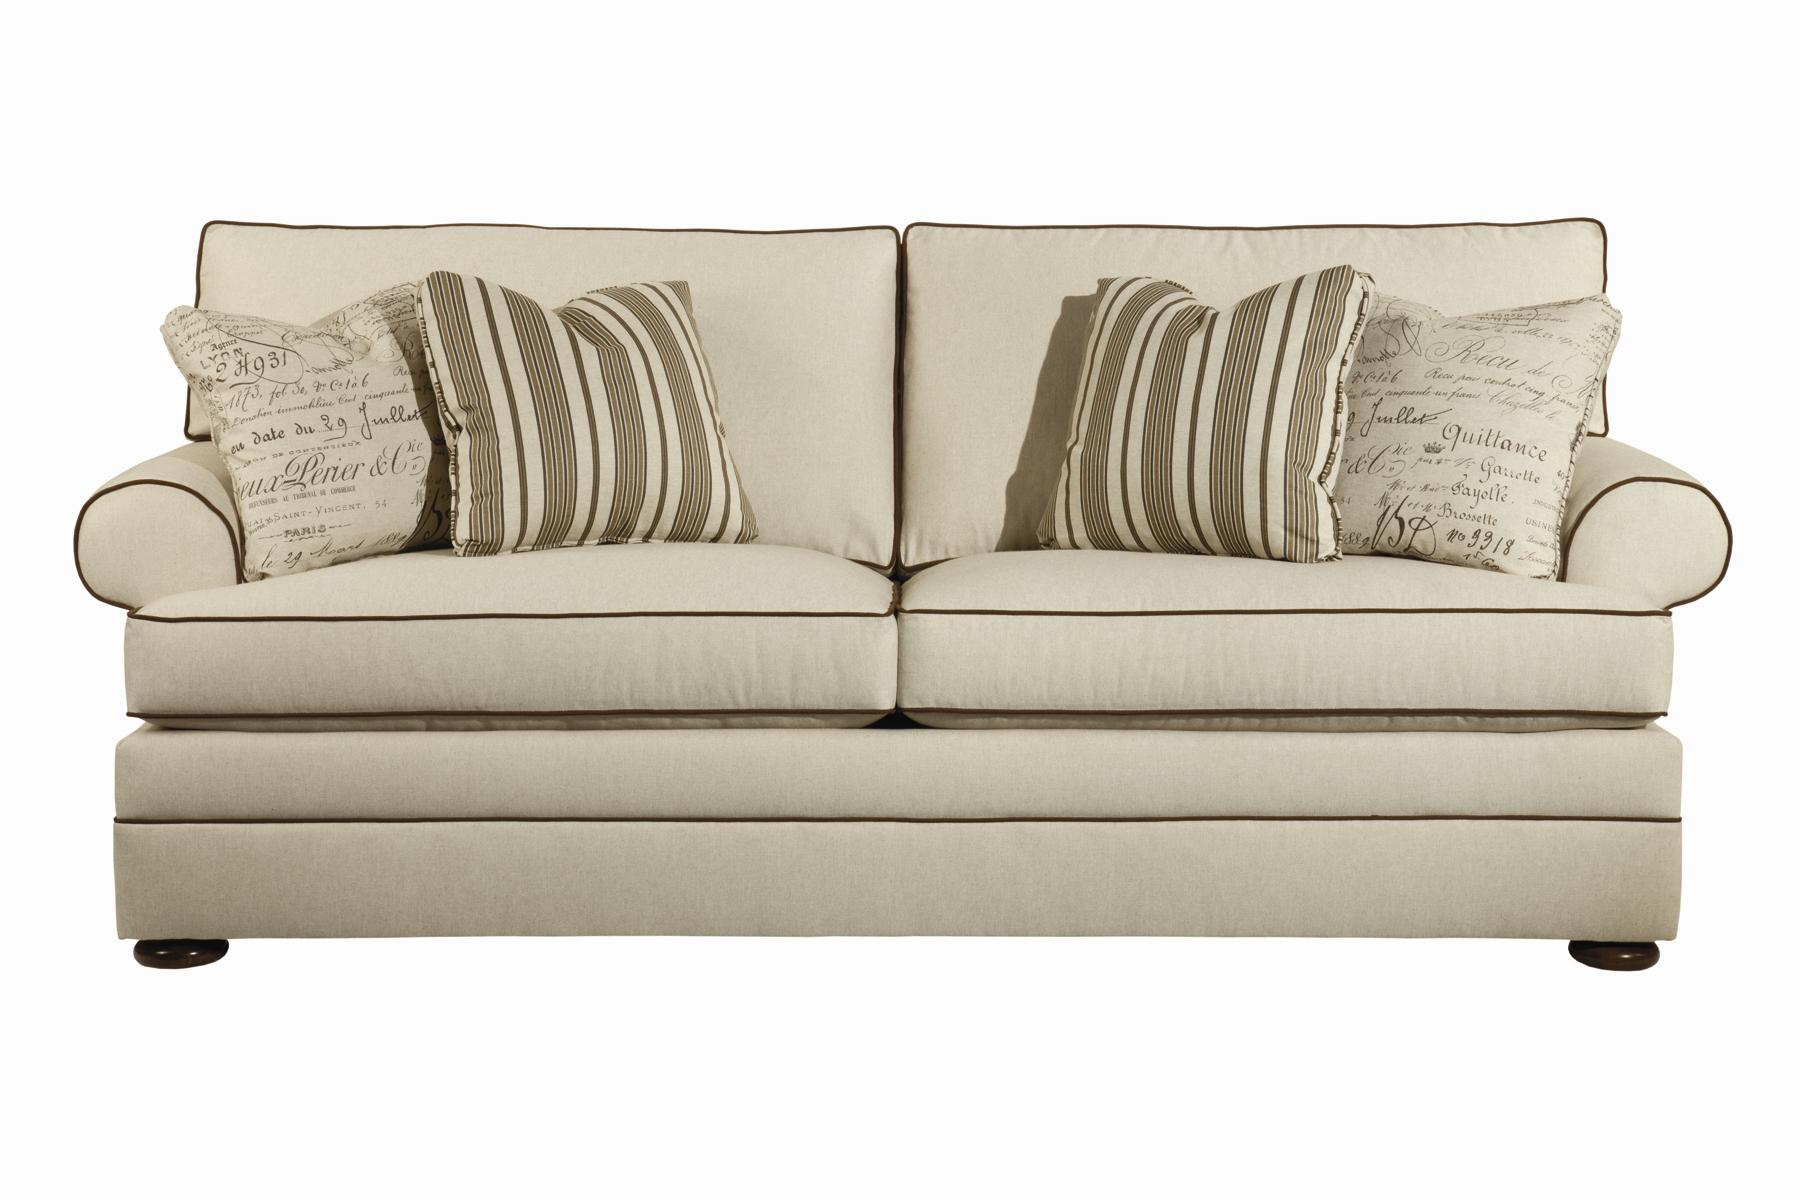 Custom Select Upholstery Custom 2-Seat Sofa by Kincaid Furniture at Johnny Janosik